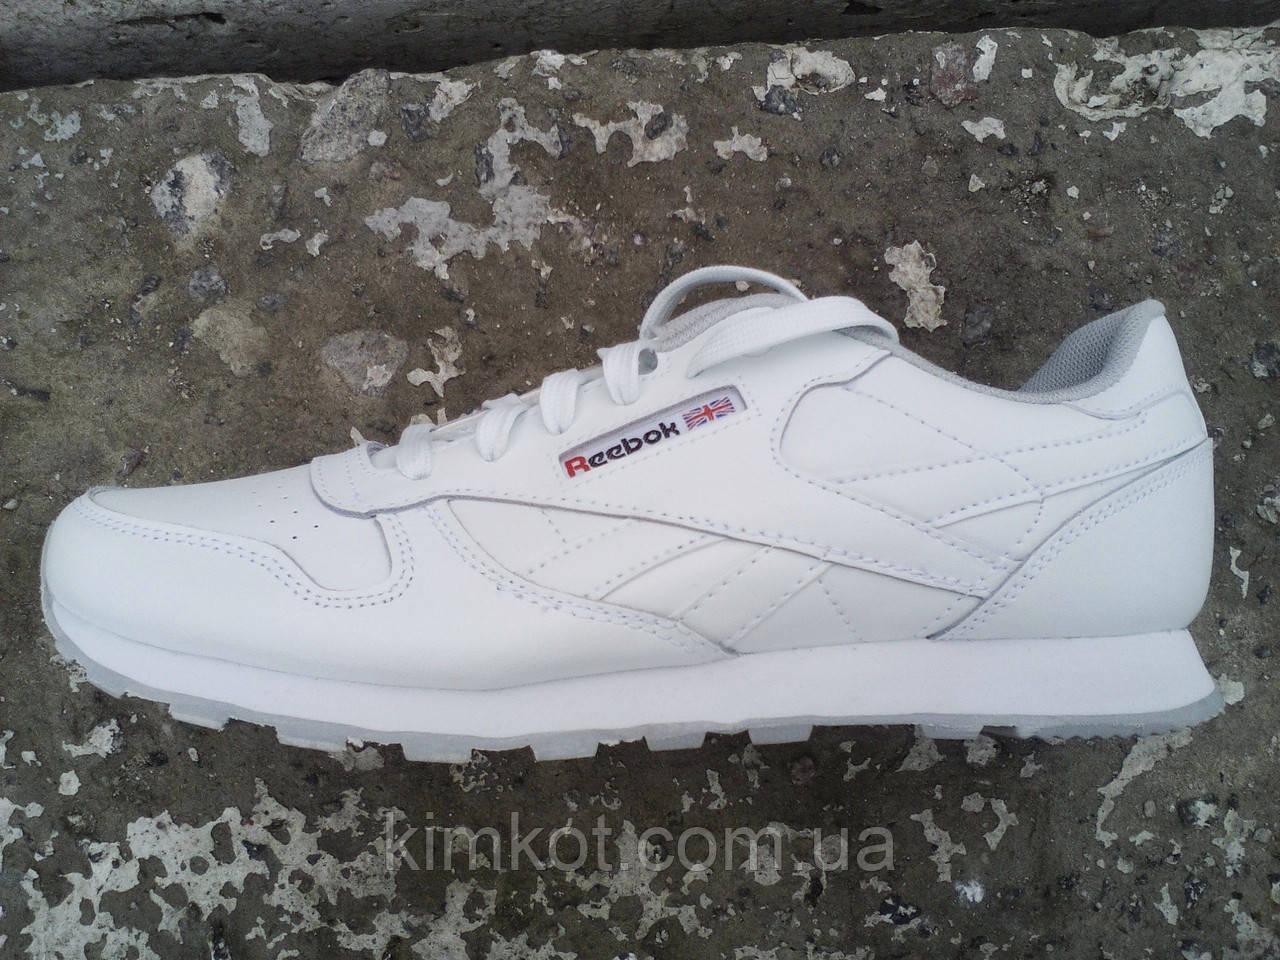 65eb529fedbd32 Кроссовки мужские белые Reebok 40 -45 р-р, цена 780 грн., купить в ...